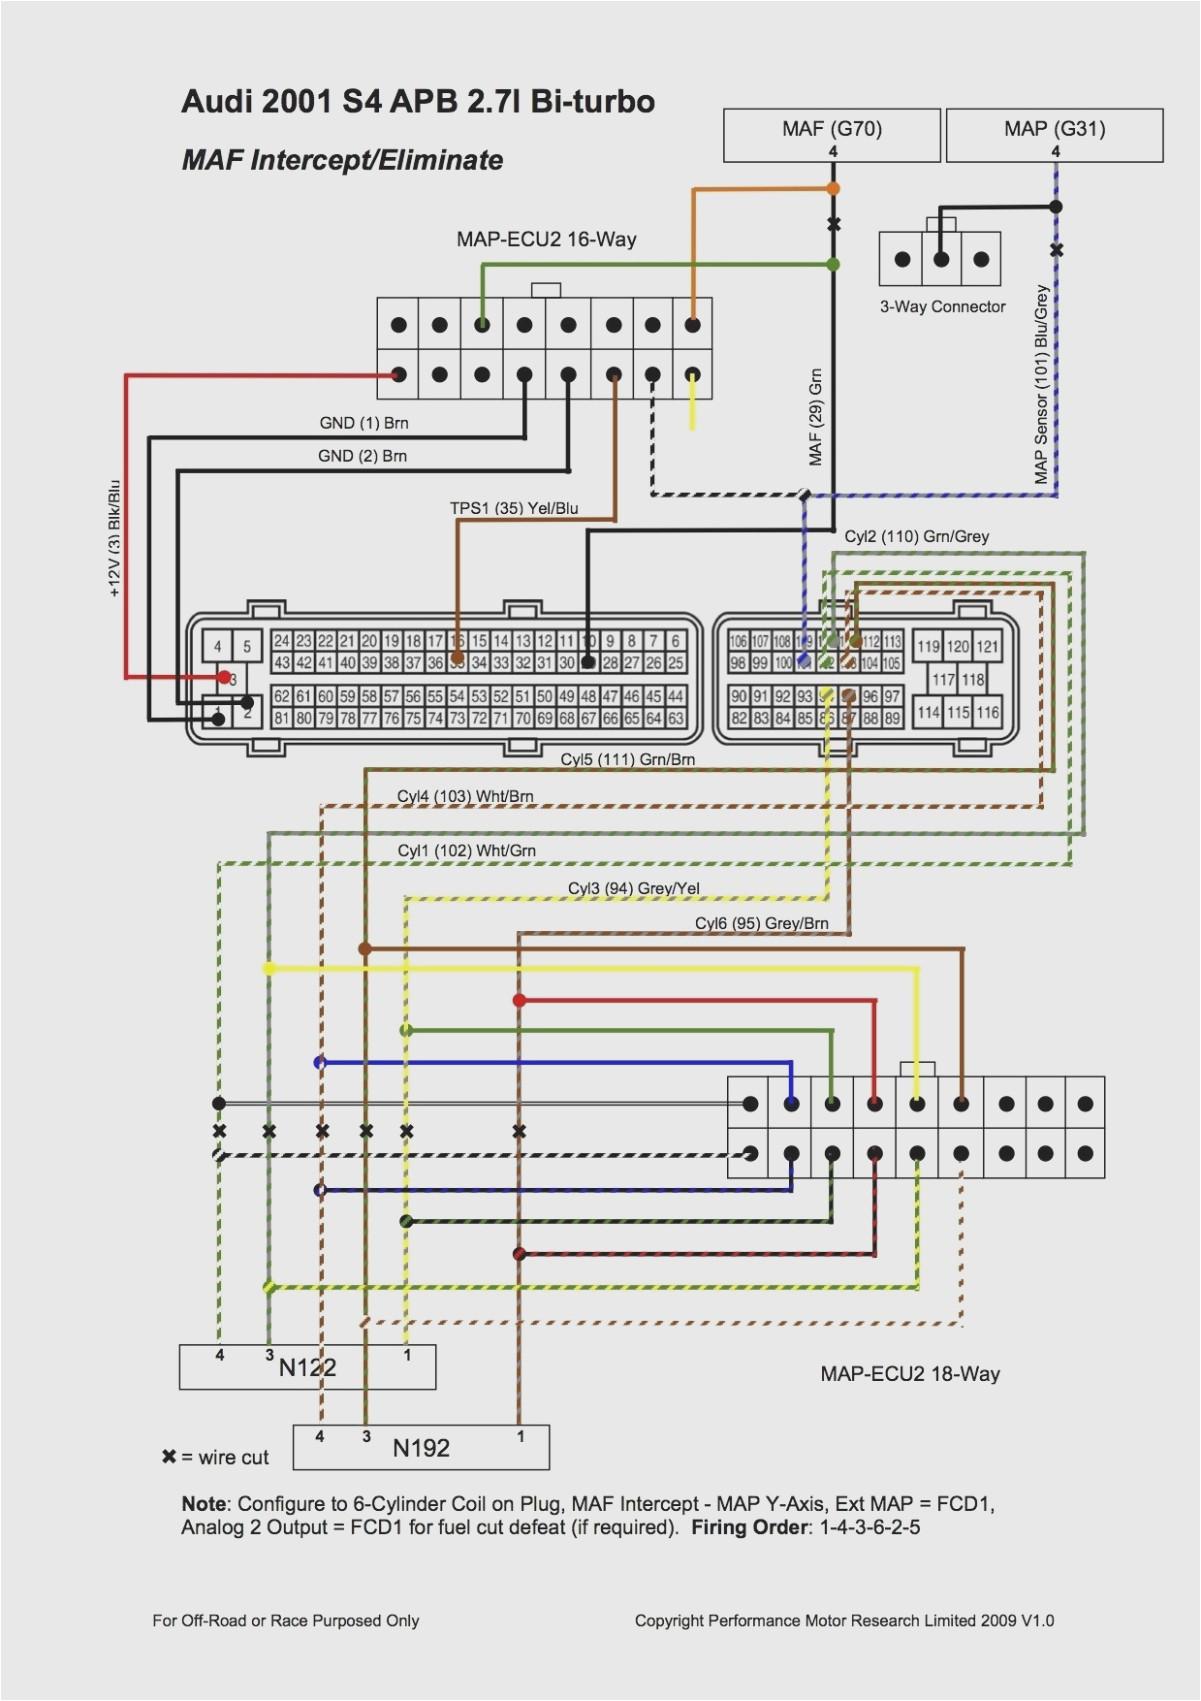 6 audi a6 wiring diagram wiring diagram 1999 audi a4 radio wiring diagram jpg